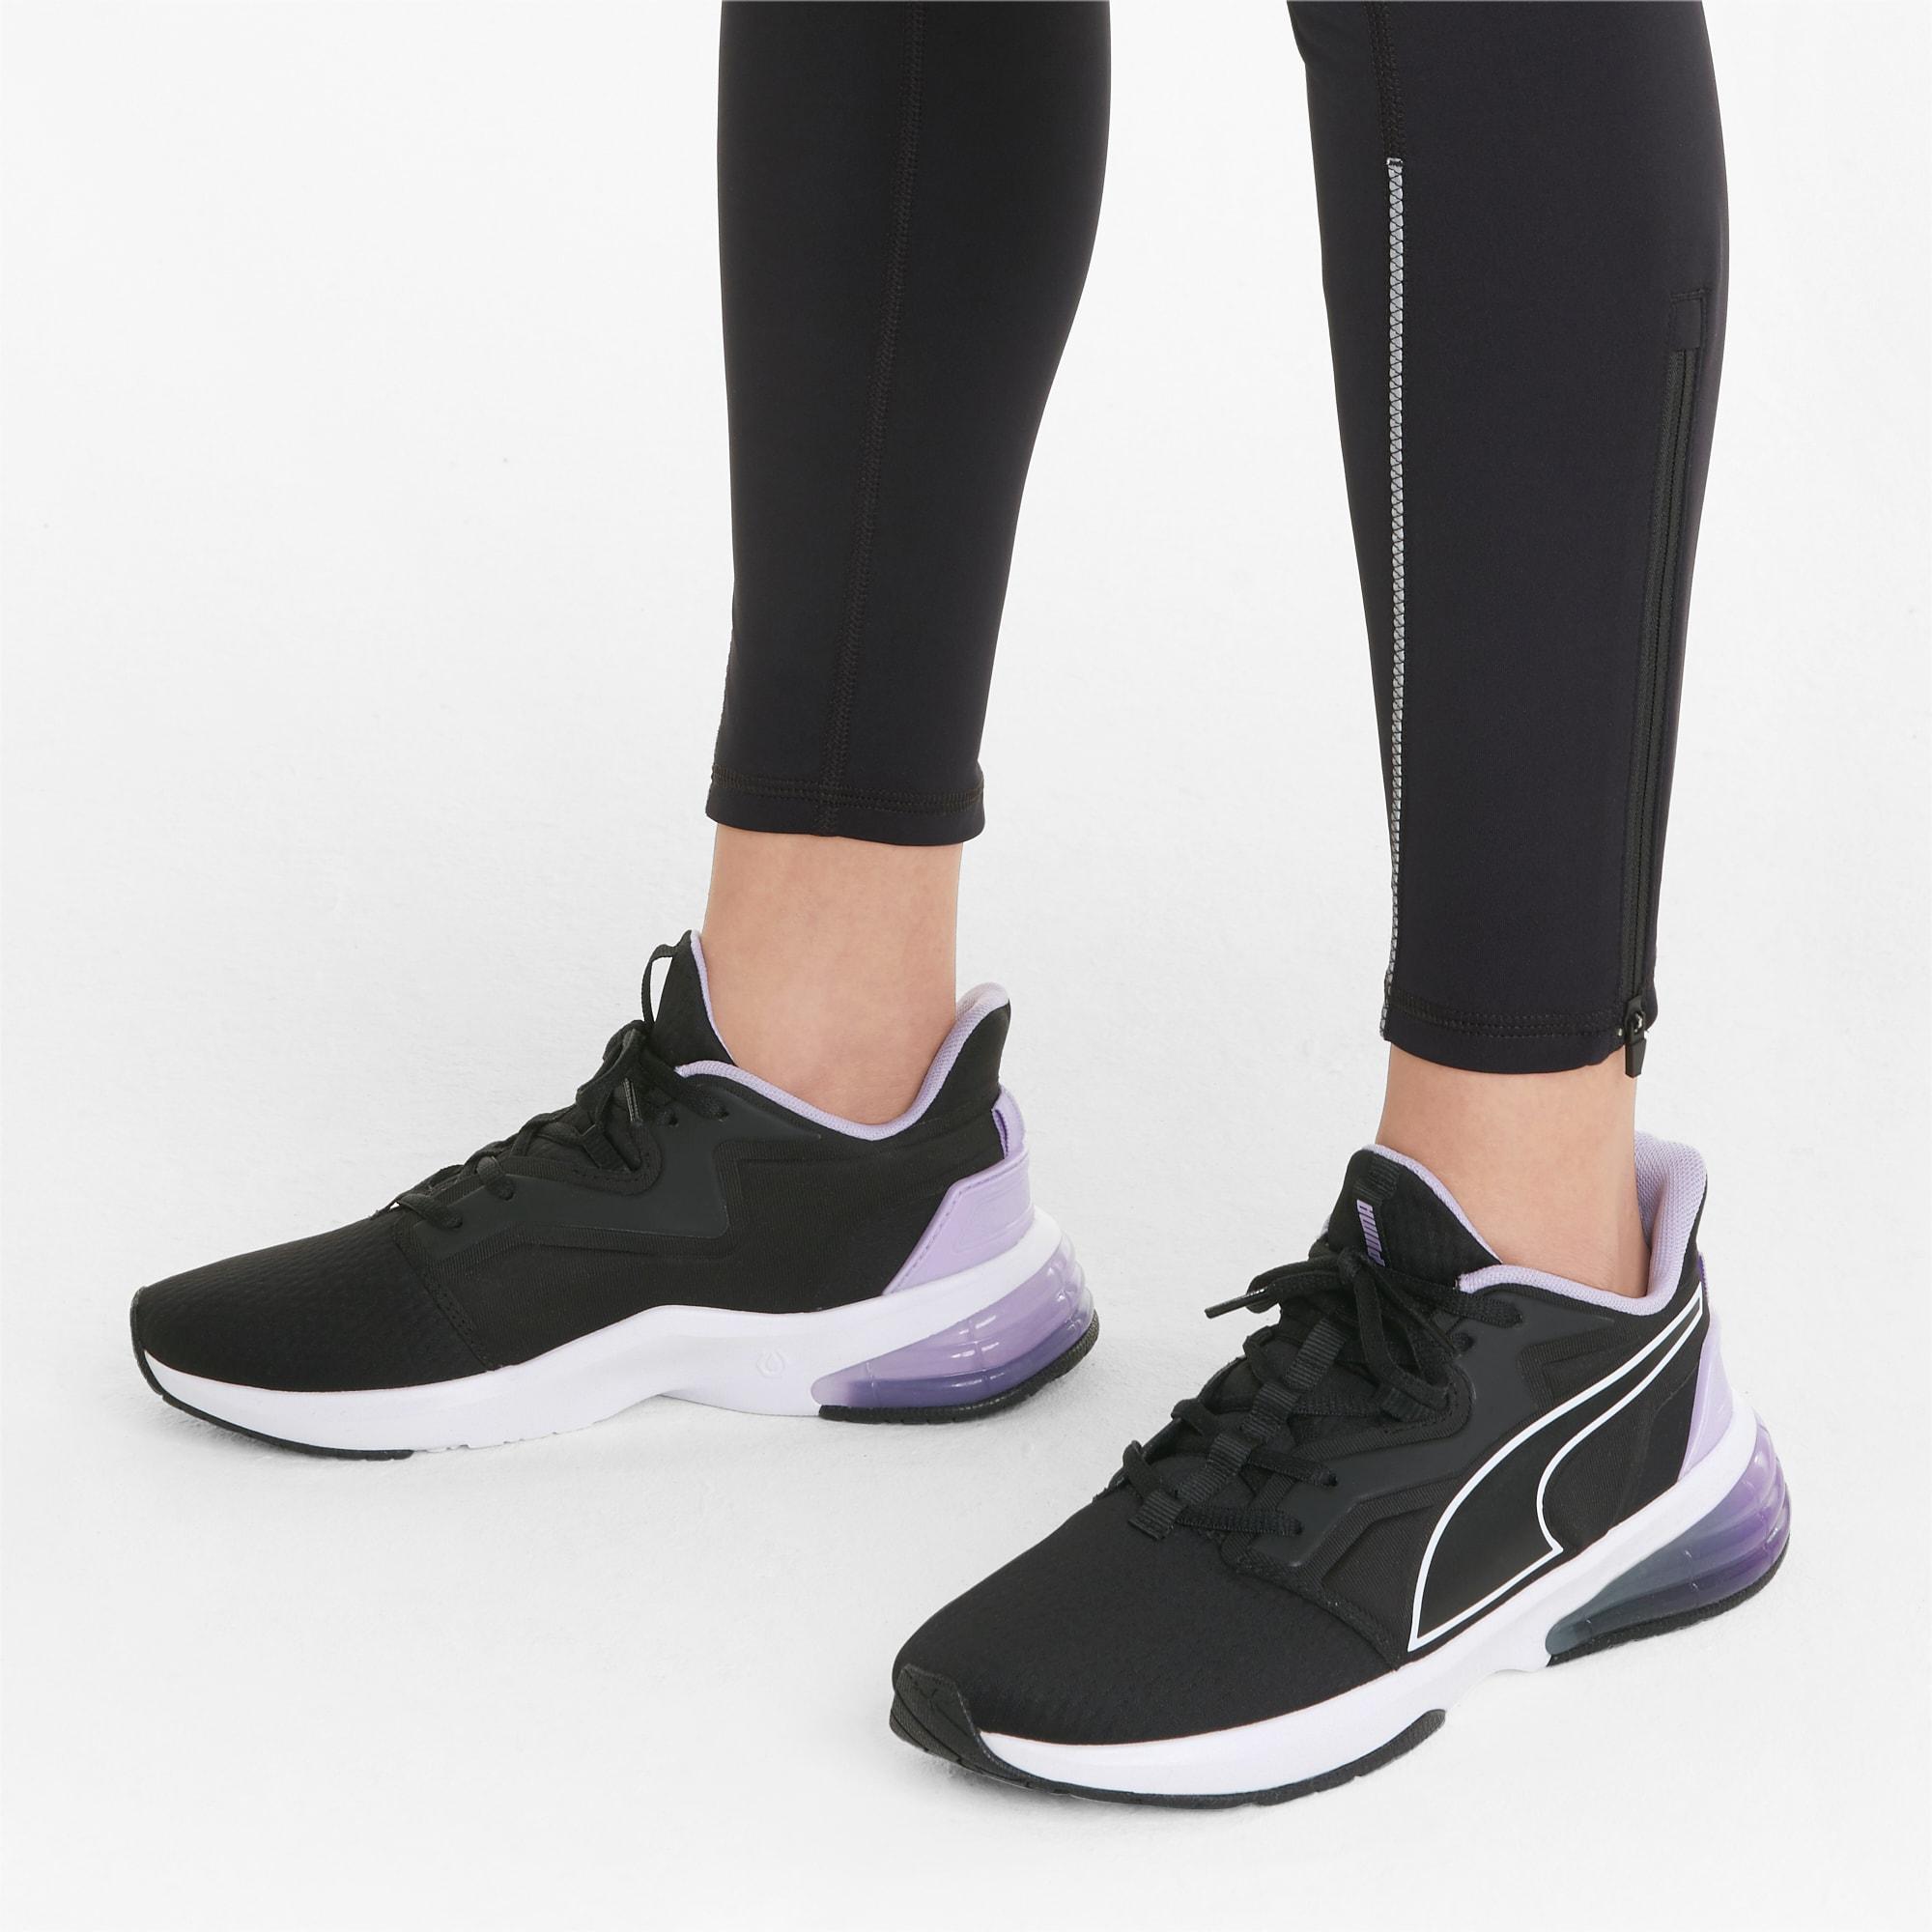 LVL-UP XT Women's Training Shoes